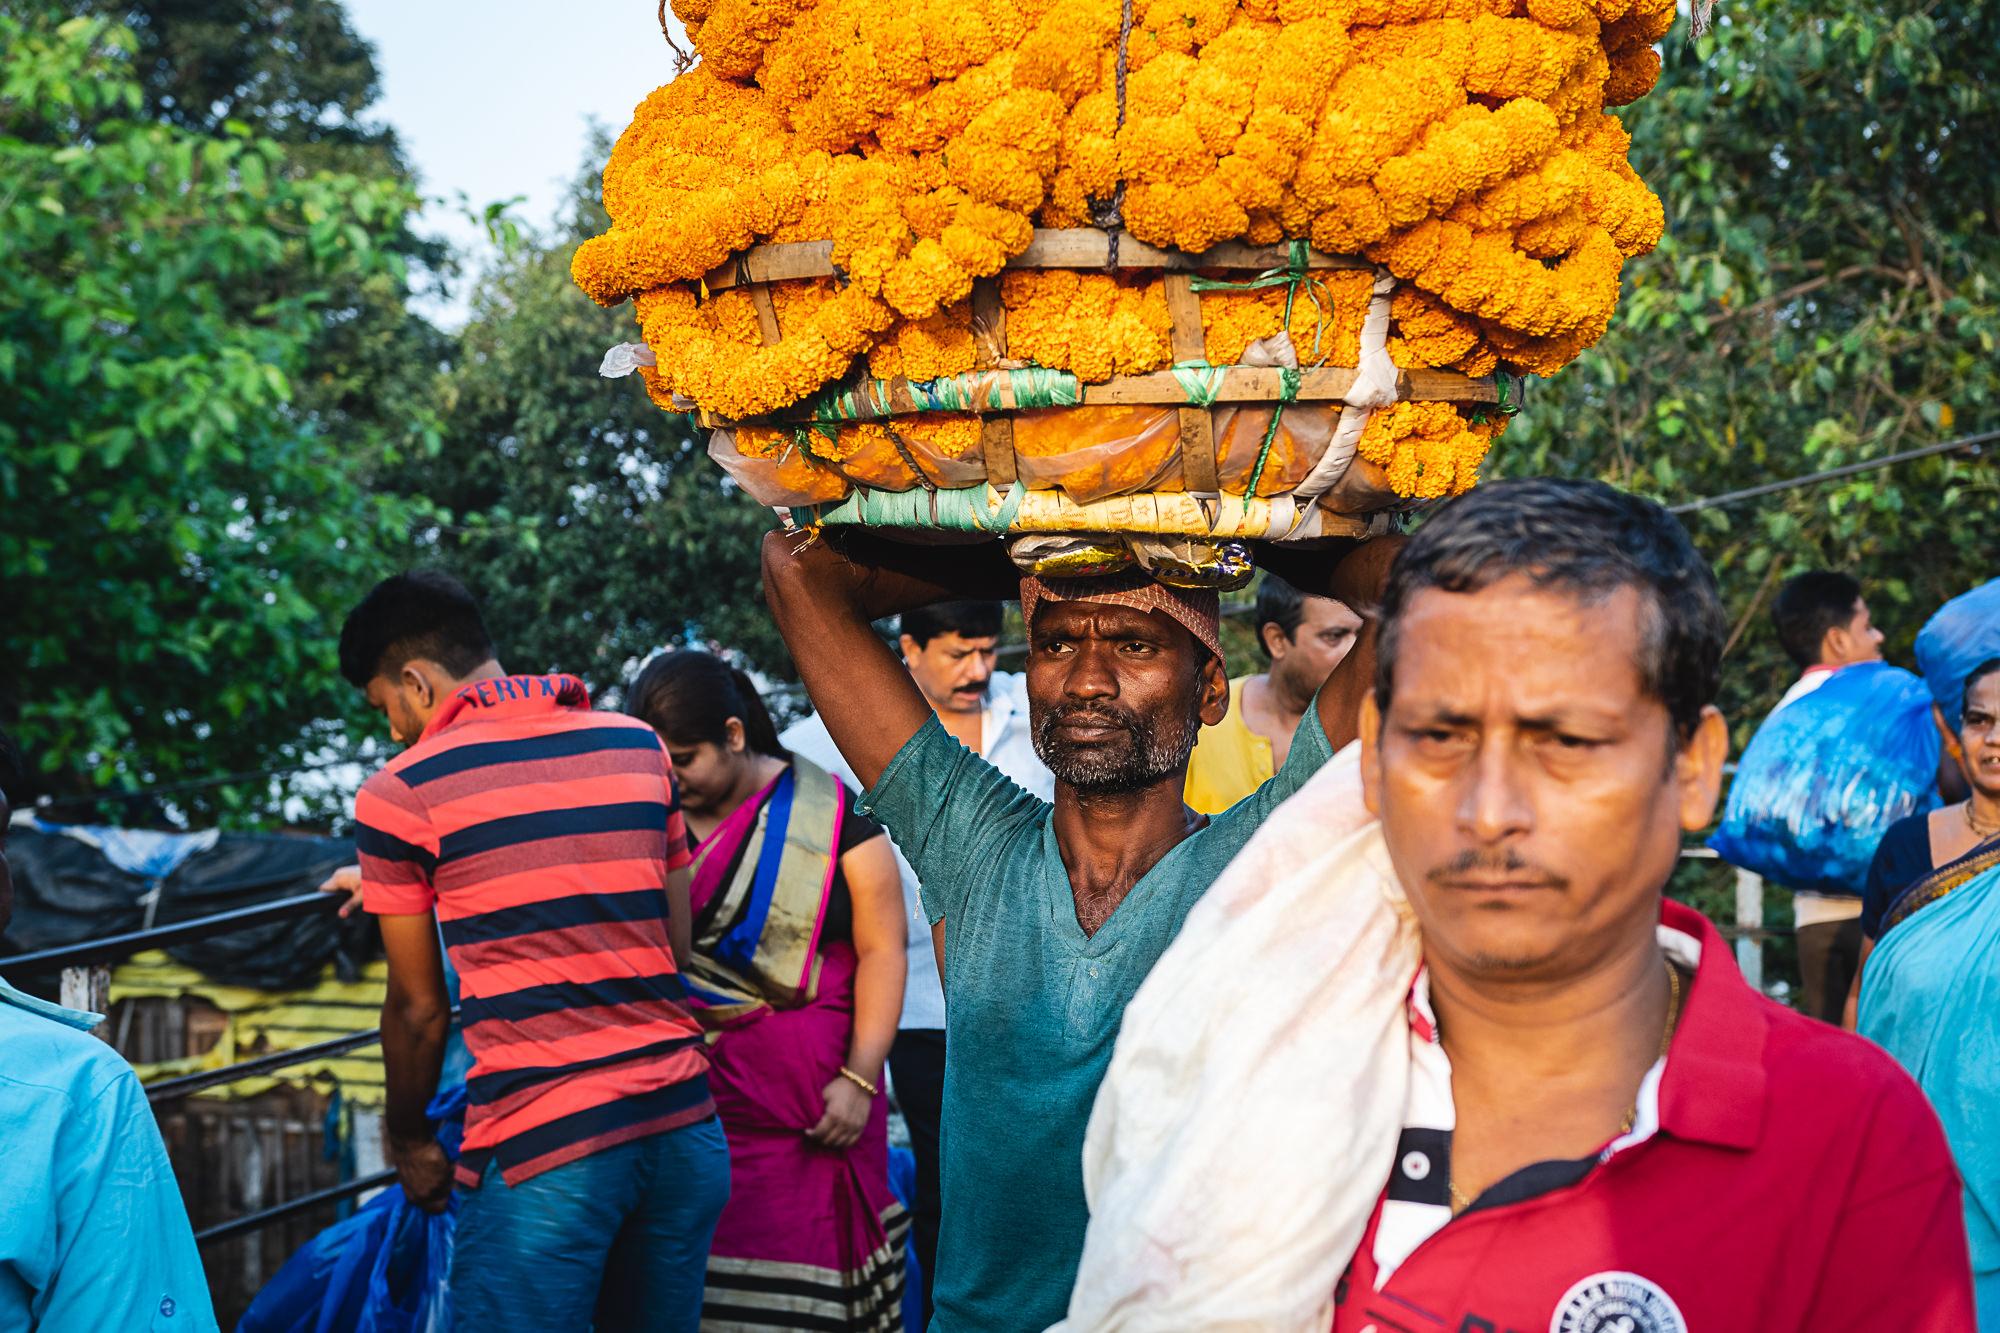 Mallik Ghat Flower Market - labourer carrying flowers on head